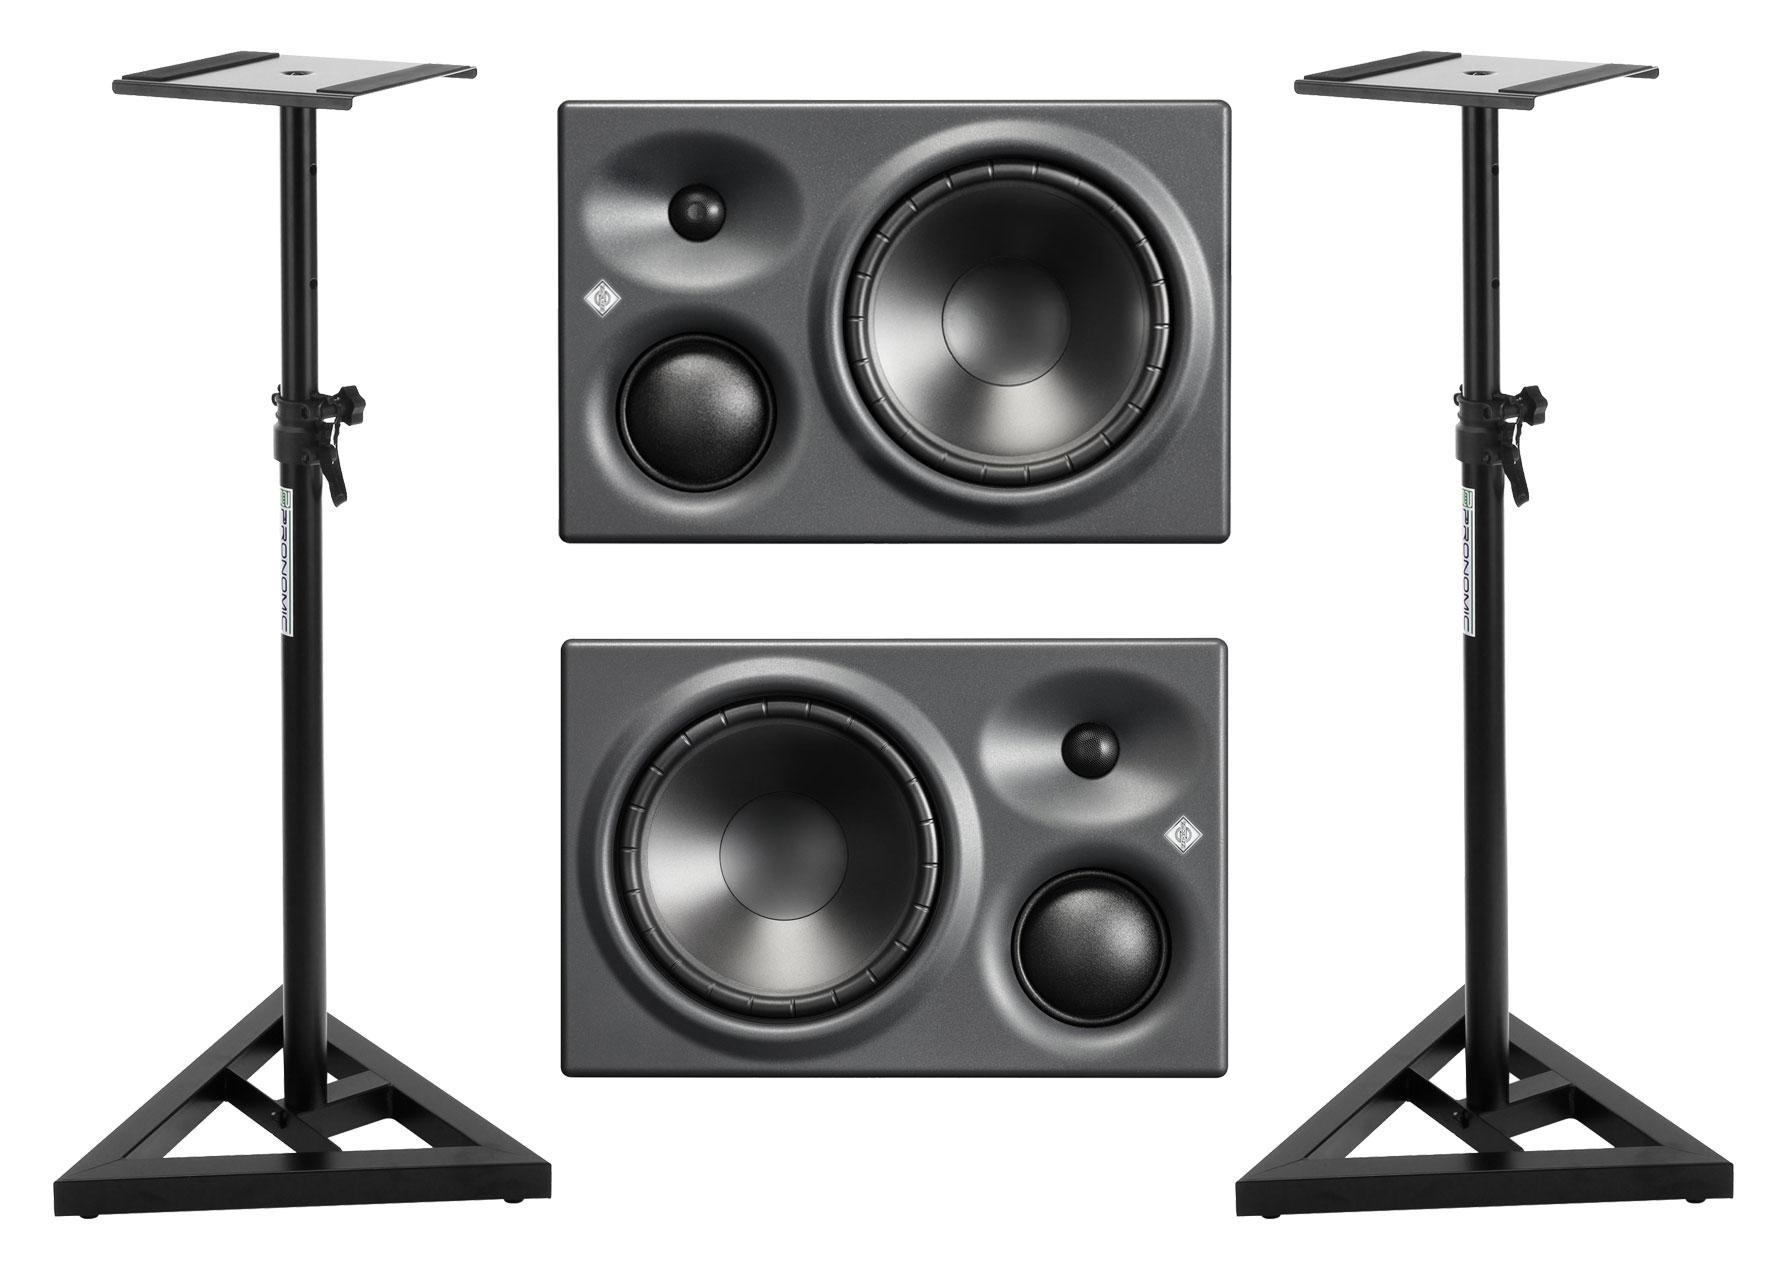 Studiomonitore - Neumann KH 310 A Studiomonitor R|L Stativ Set - Onlineshop Musikhaus Kirstein